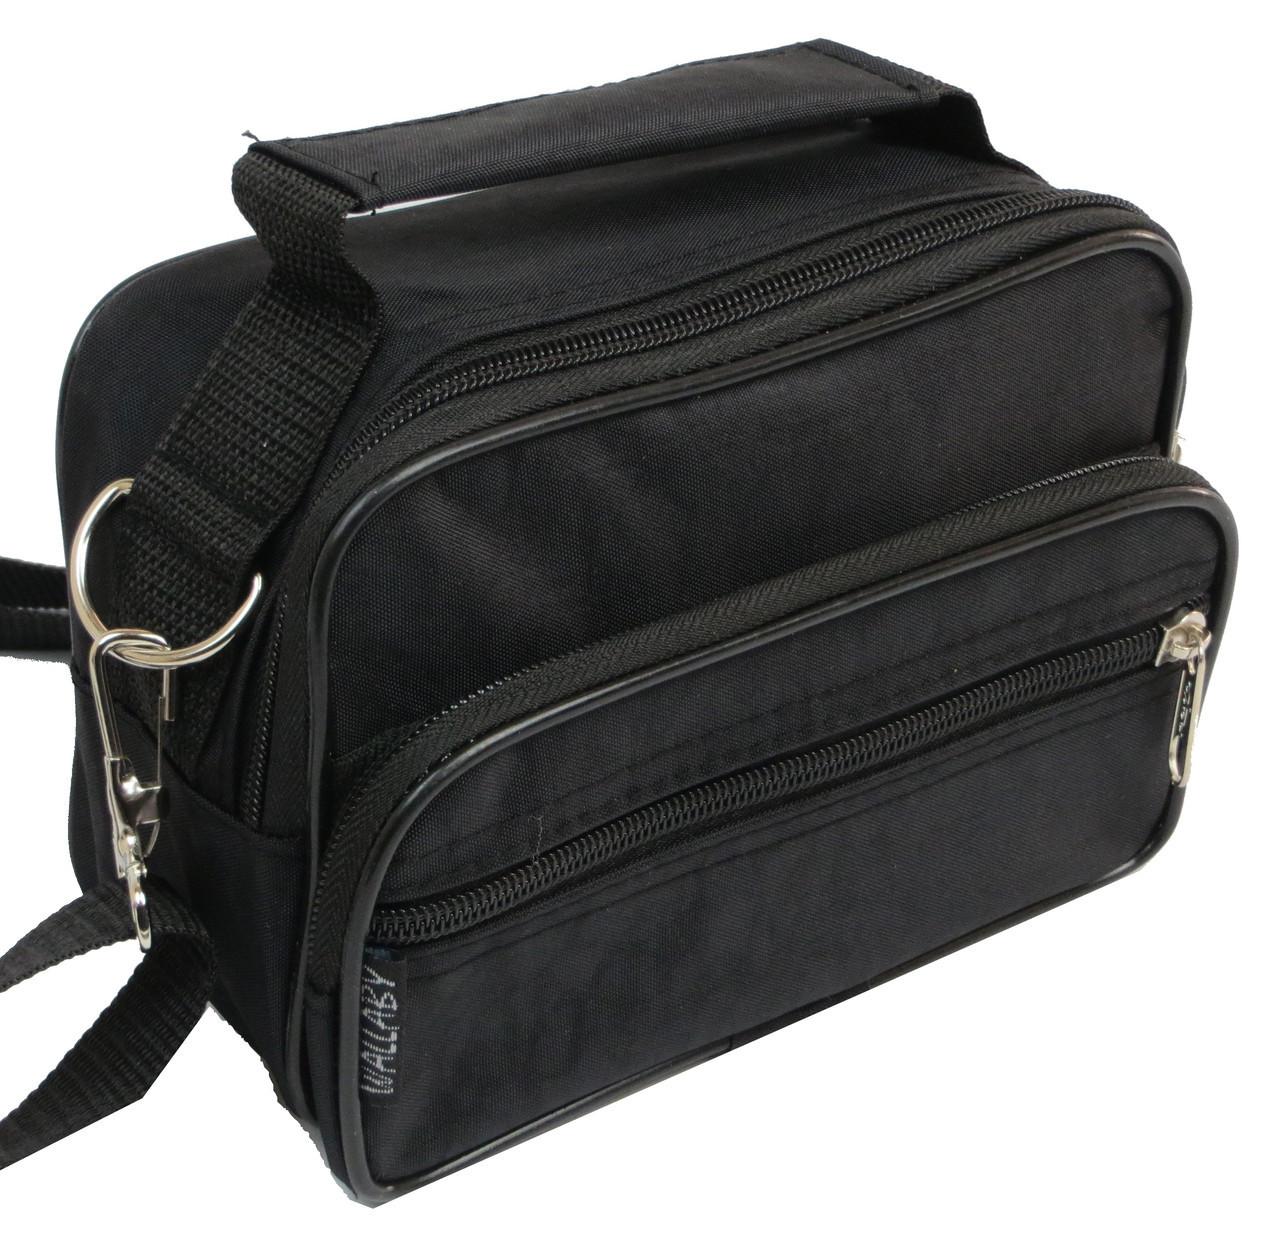 fe7ecffe3851 Мужская сумка через плечо Wallaby 2663 черная барсетка на пояс 19х14х7см -  Интернет-магазин